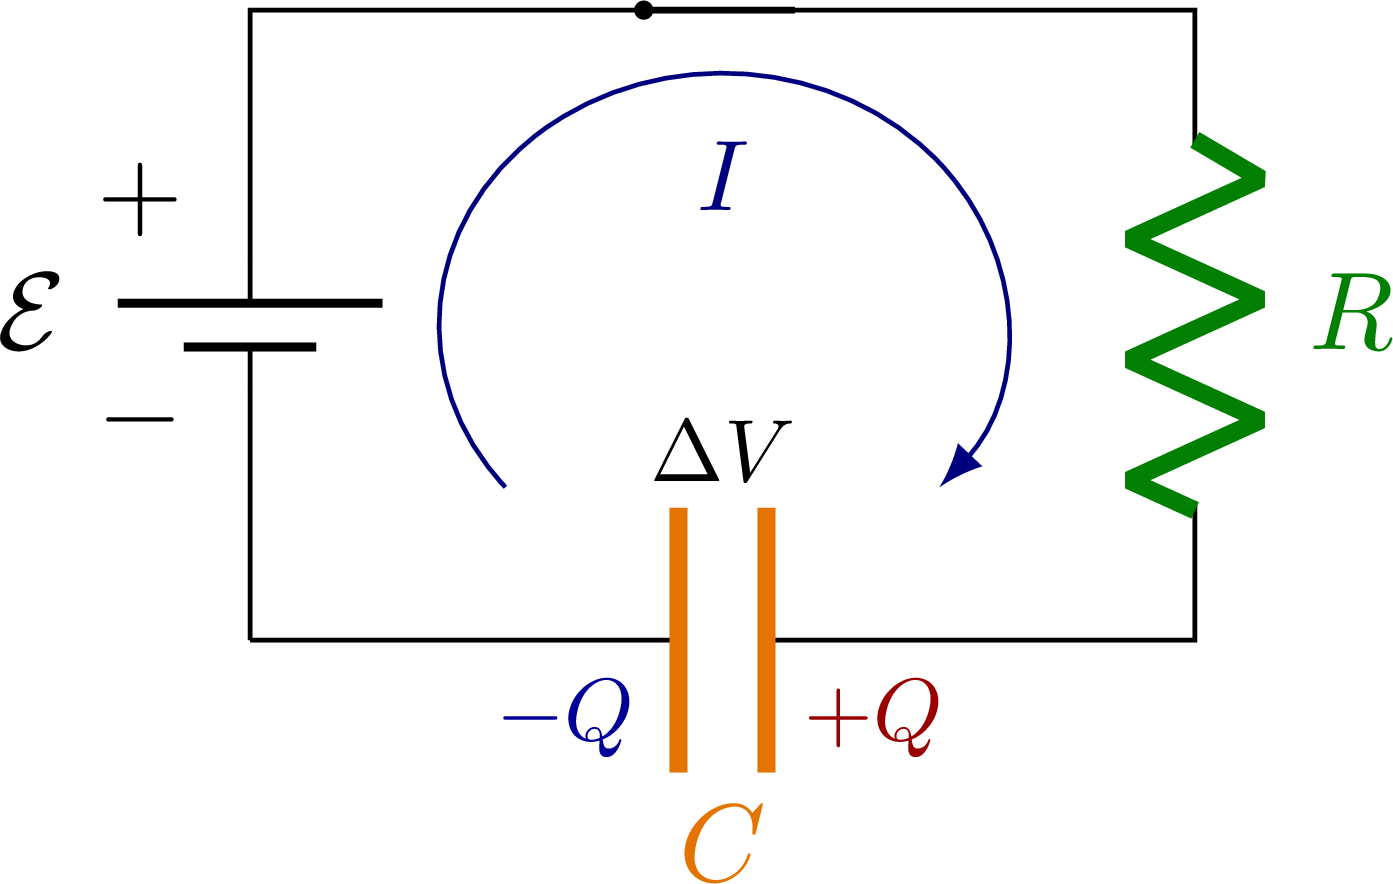 electric_circuit_rc-004.png